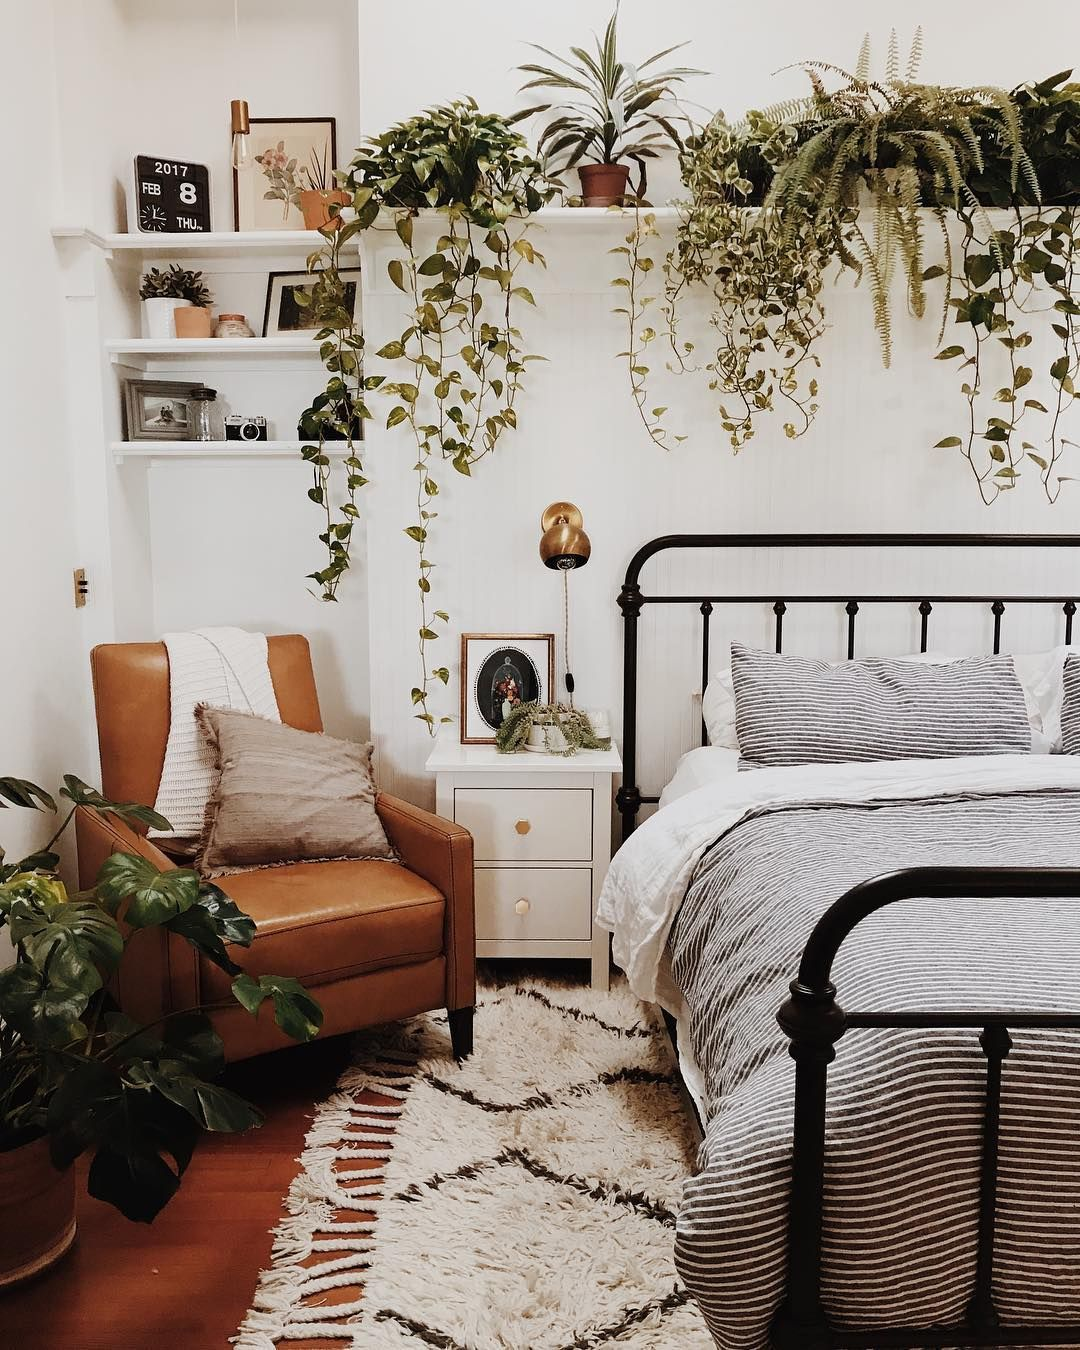 Pin by nur aishah zulkifli on warwick bedroom in pinterest